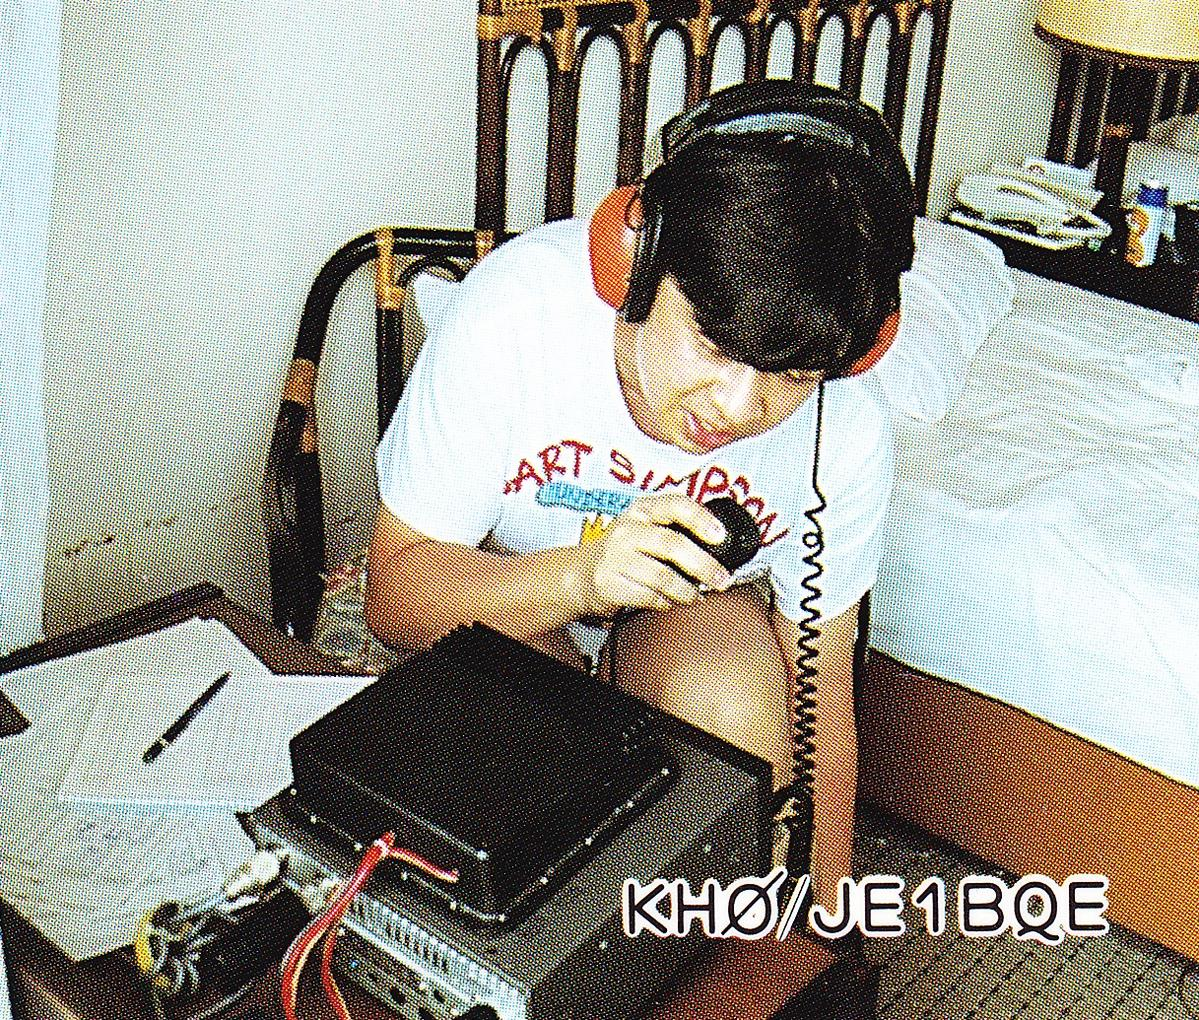 Primary Image for KH0/JE1BQE